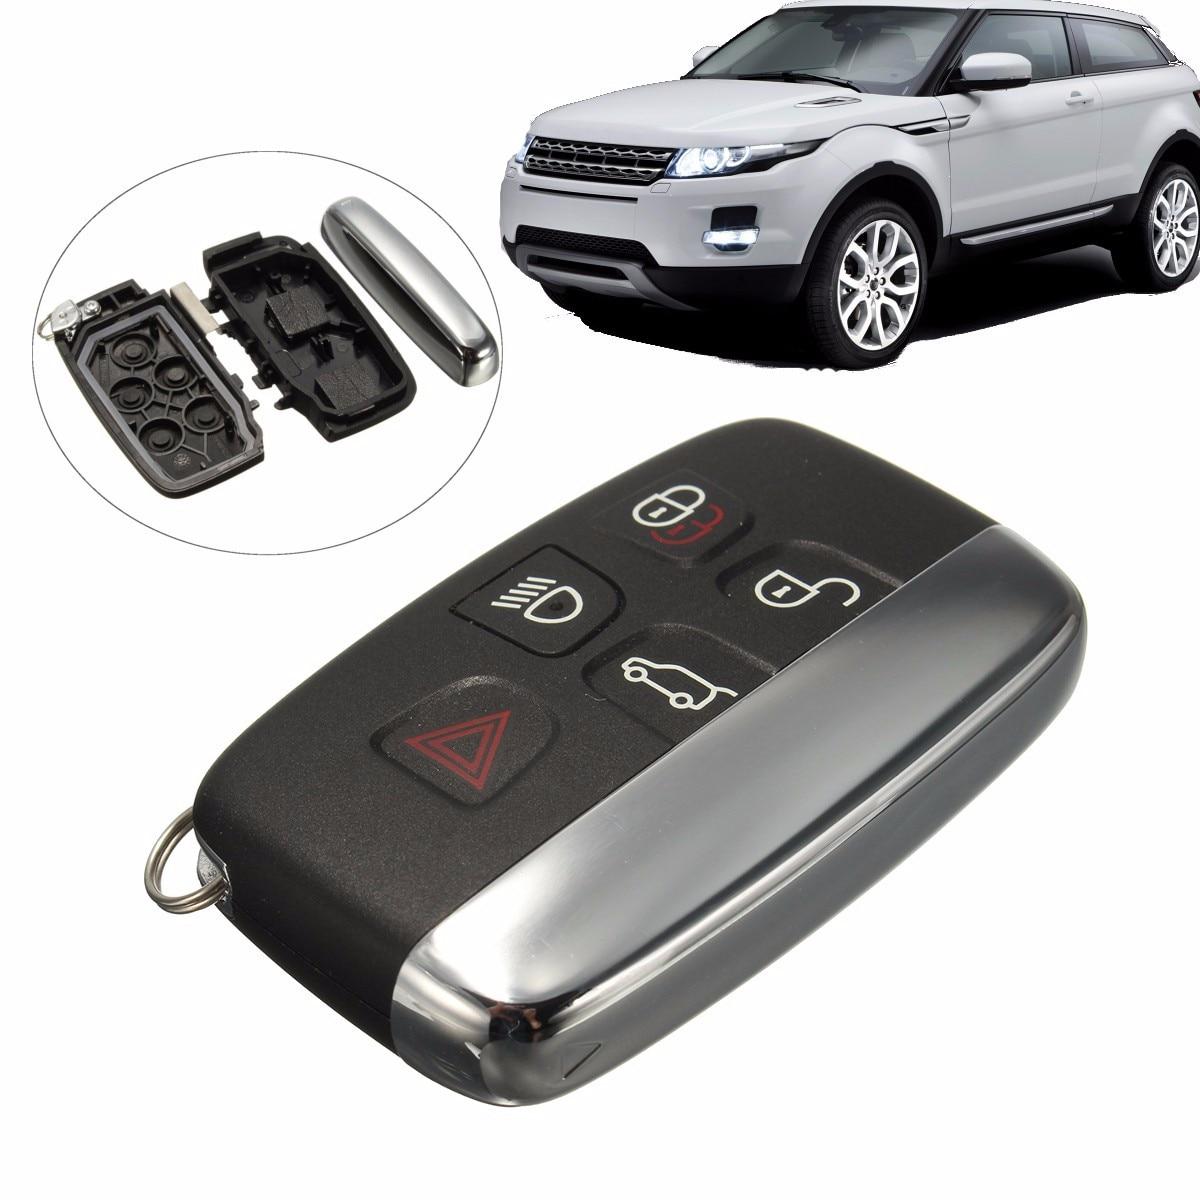 5 Button Remote FOB Key Case Cover Shell For LAND ROVER LR4 Range Rover Sport Evoque5 Button Remote FOB Key Case Cover Shell For LAND ROVER LR4 Range Rover Sport Evoque